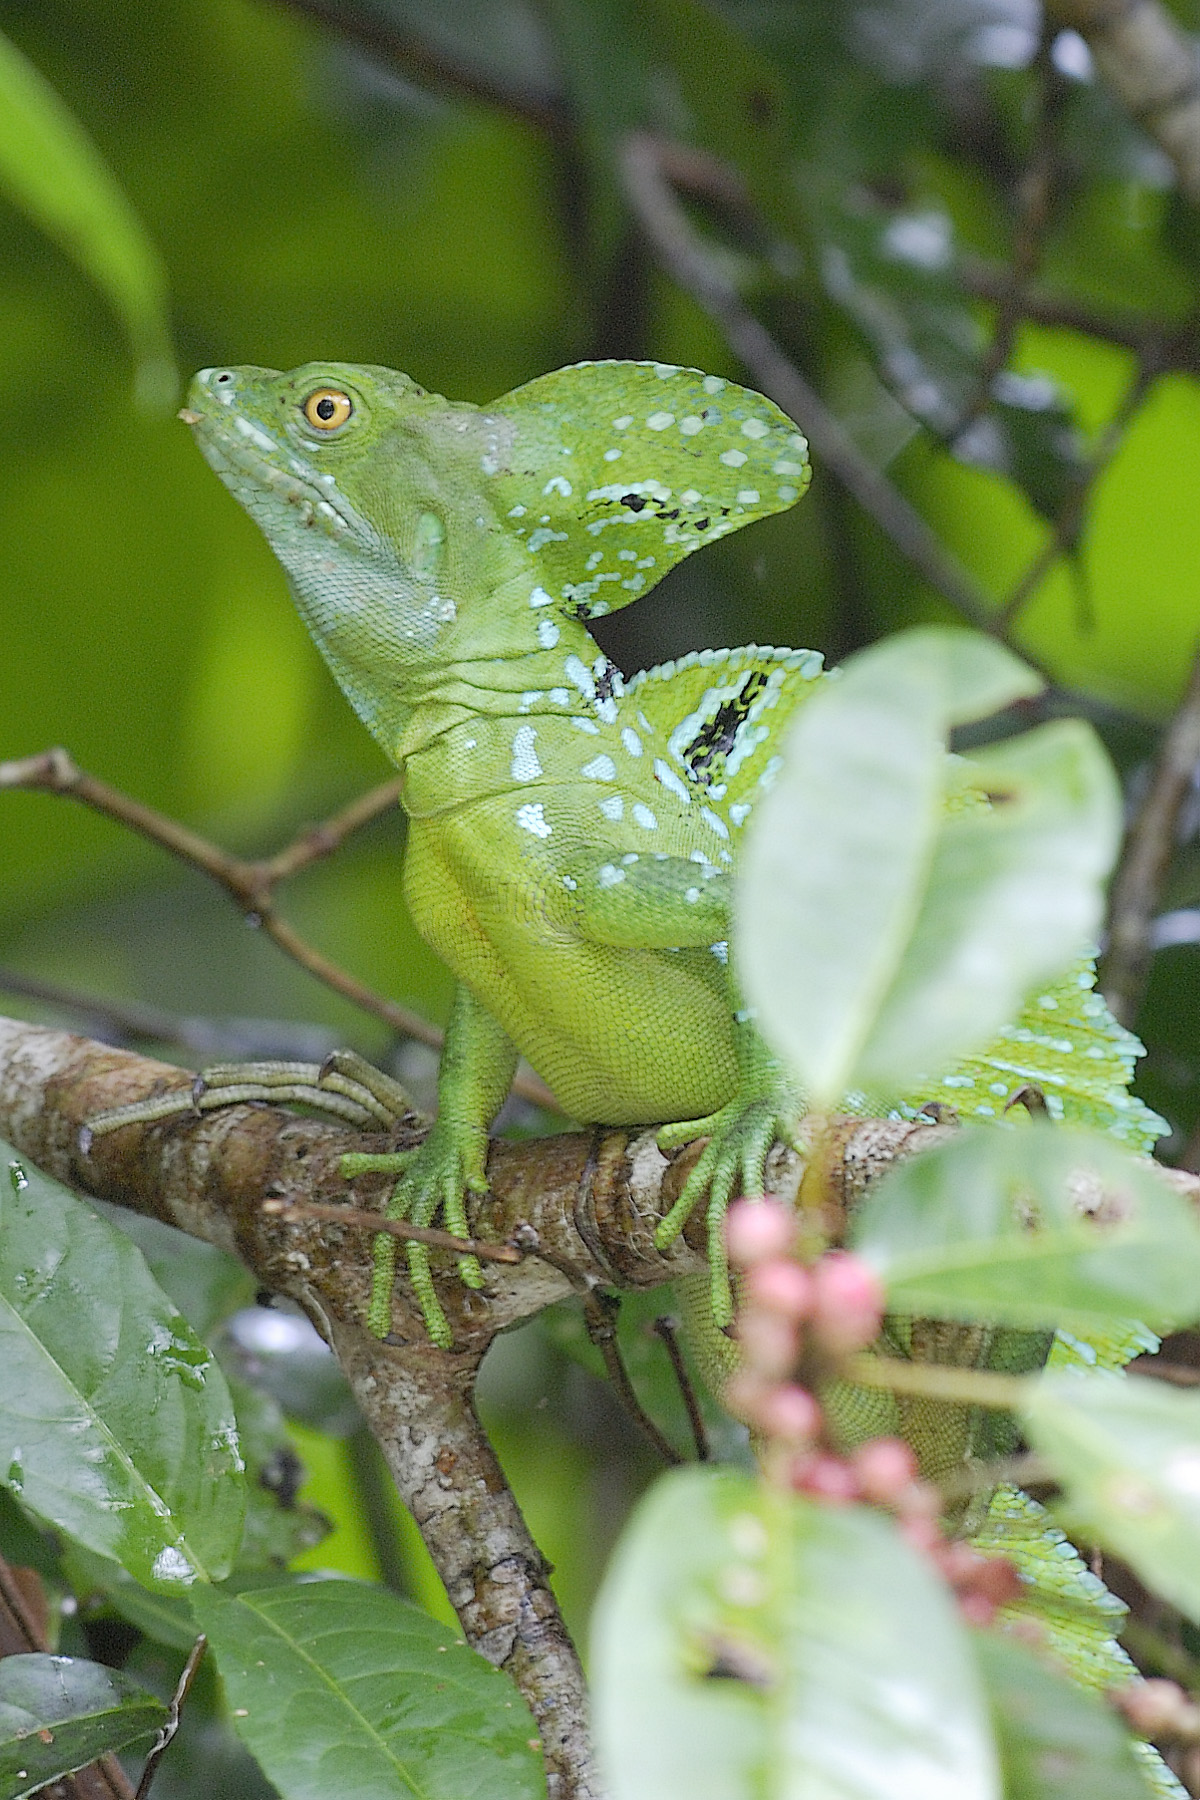 20070630 - Costa Rica - 1056.jpg